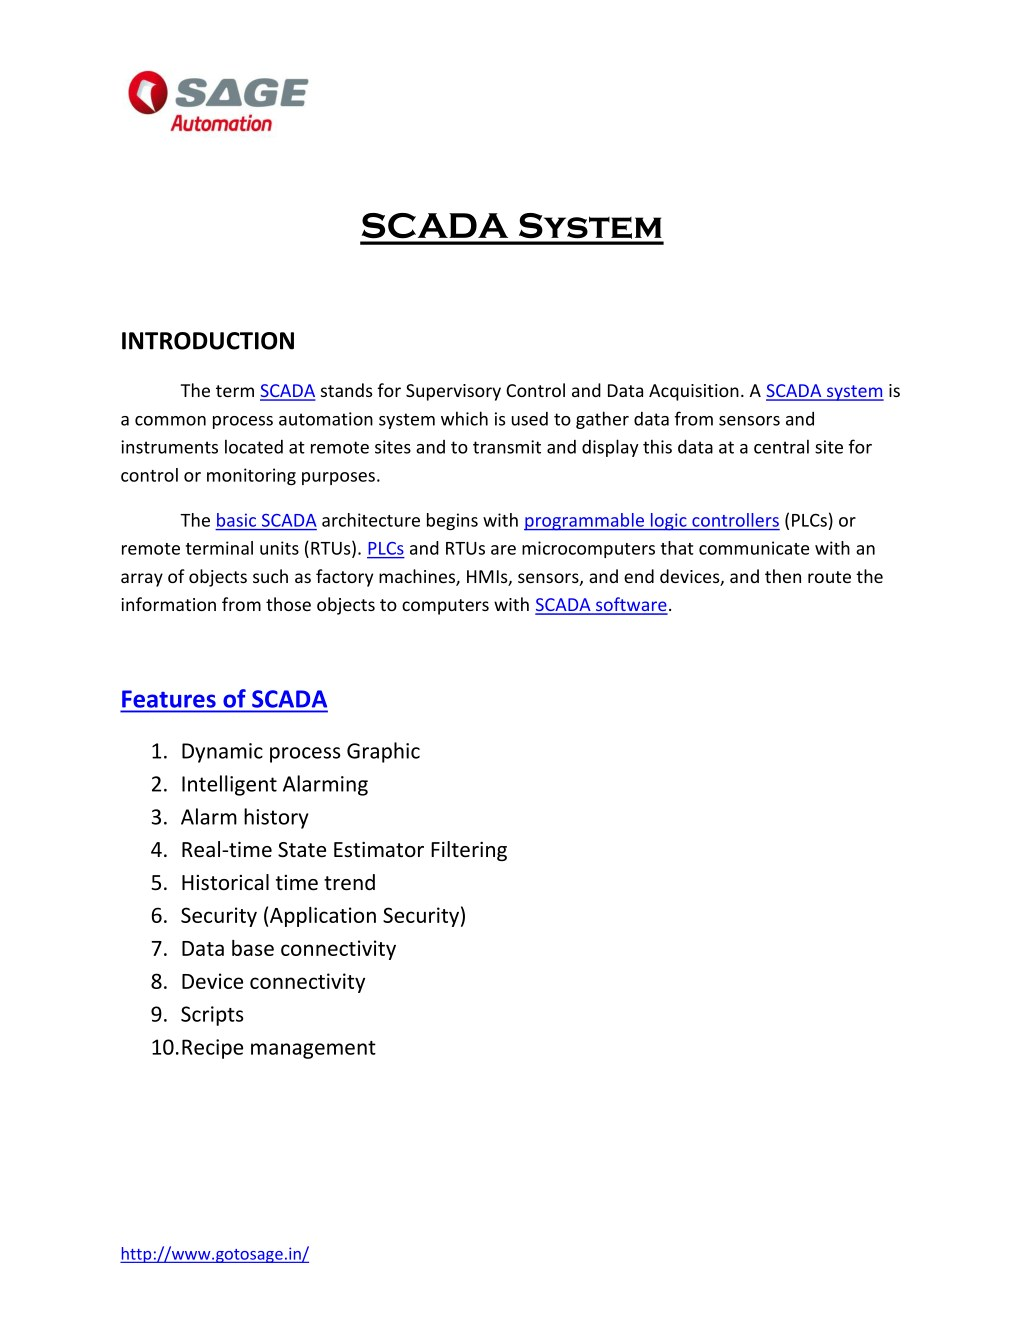 PPT - PDF on SCADA System   SCADA Courses  Sage Automation